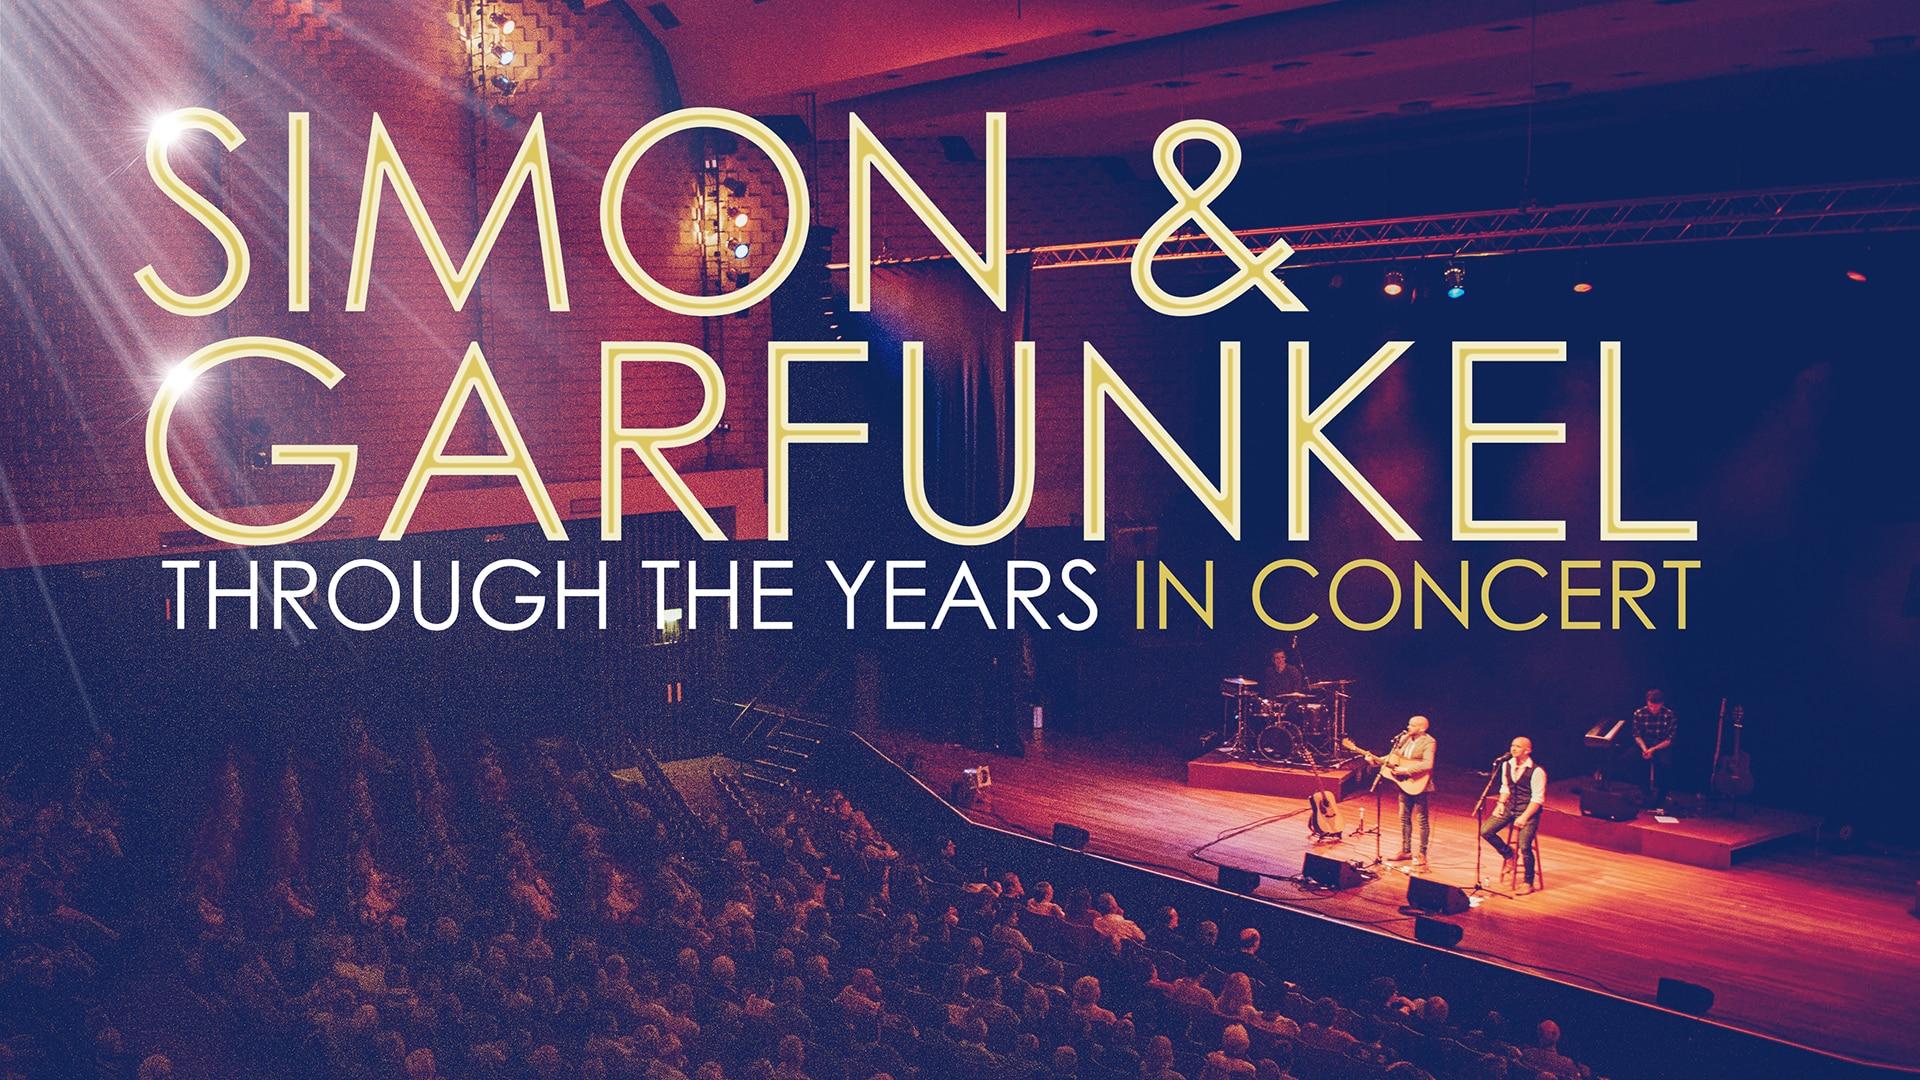 Simon & Garfunkel through the years in Concert